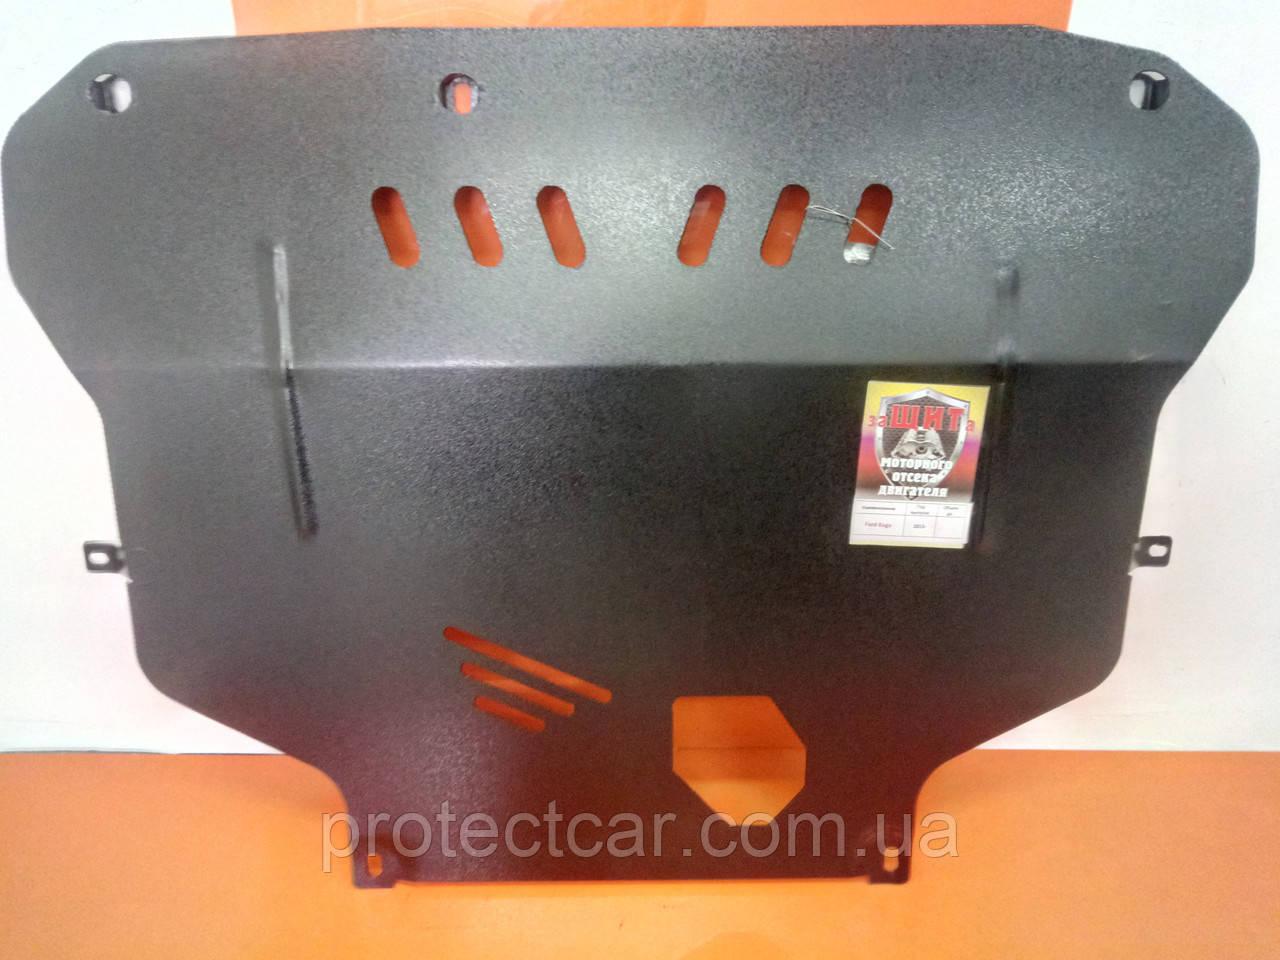 Захист двигуна Ford Escape 3 (2012-2019)